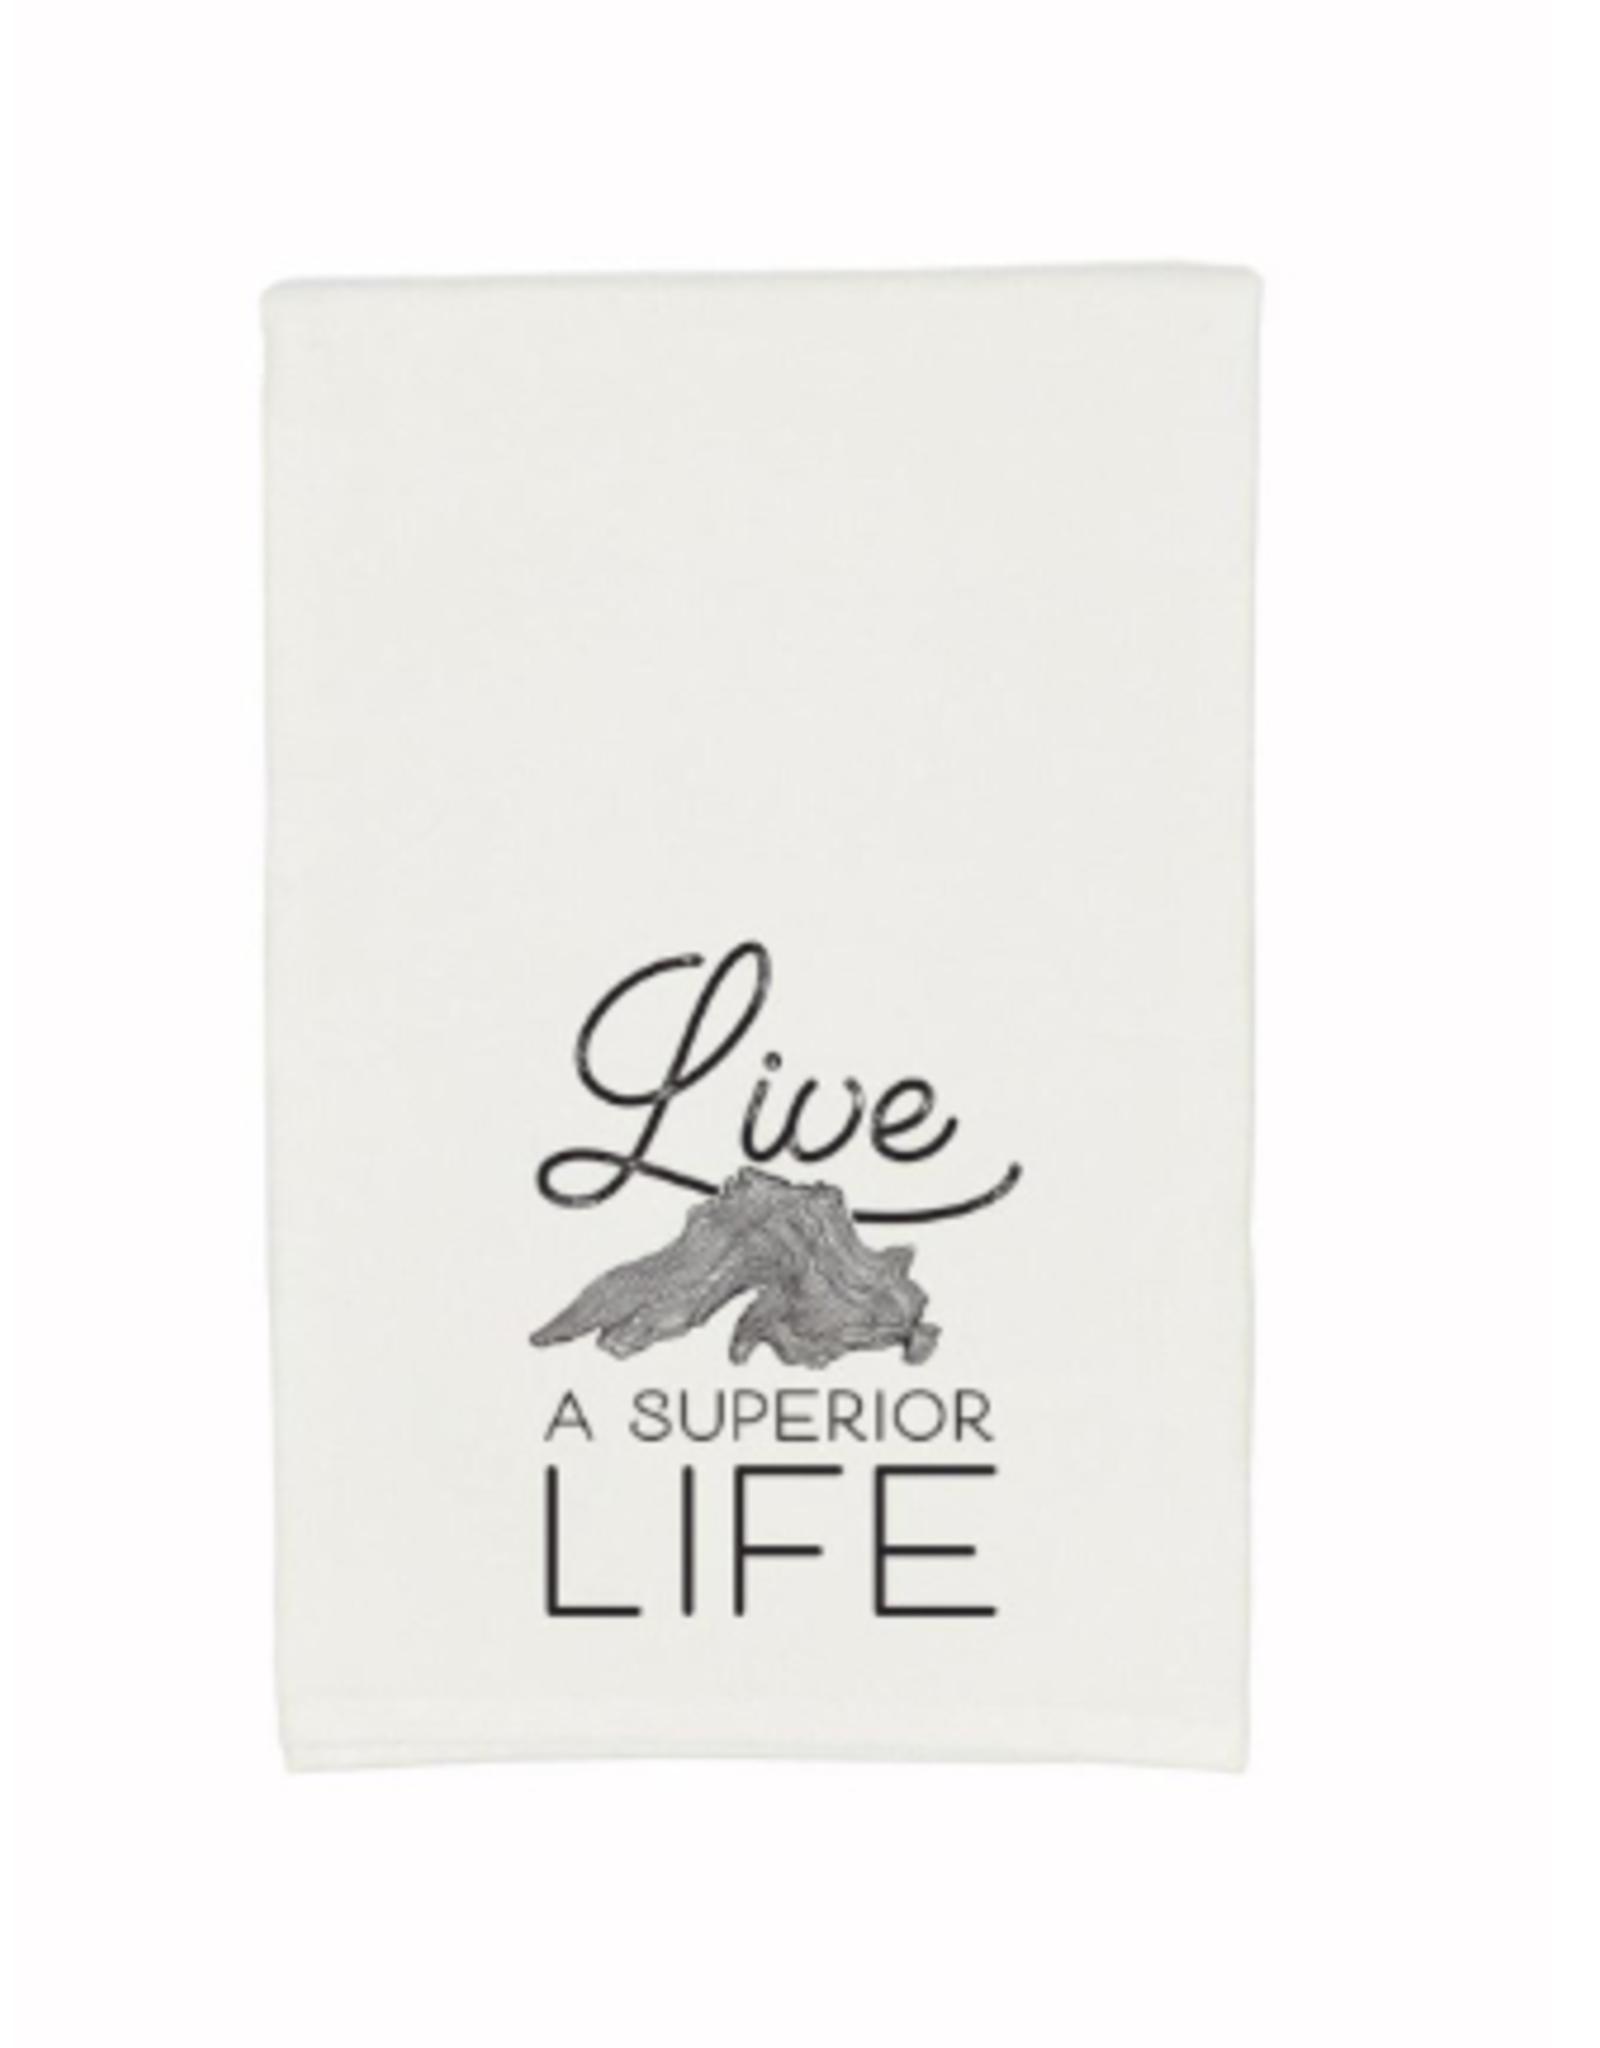 Gitch Gear Lake Superior Tea Towel, Live Superior